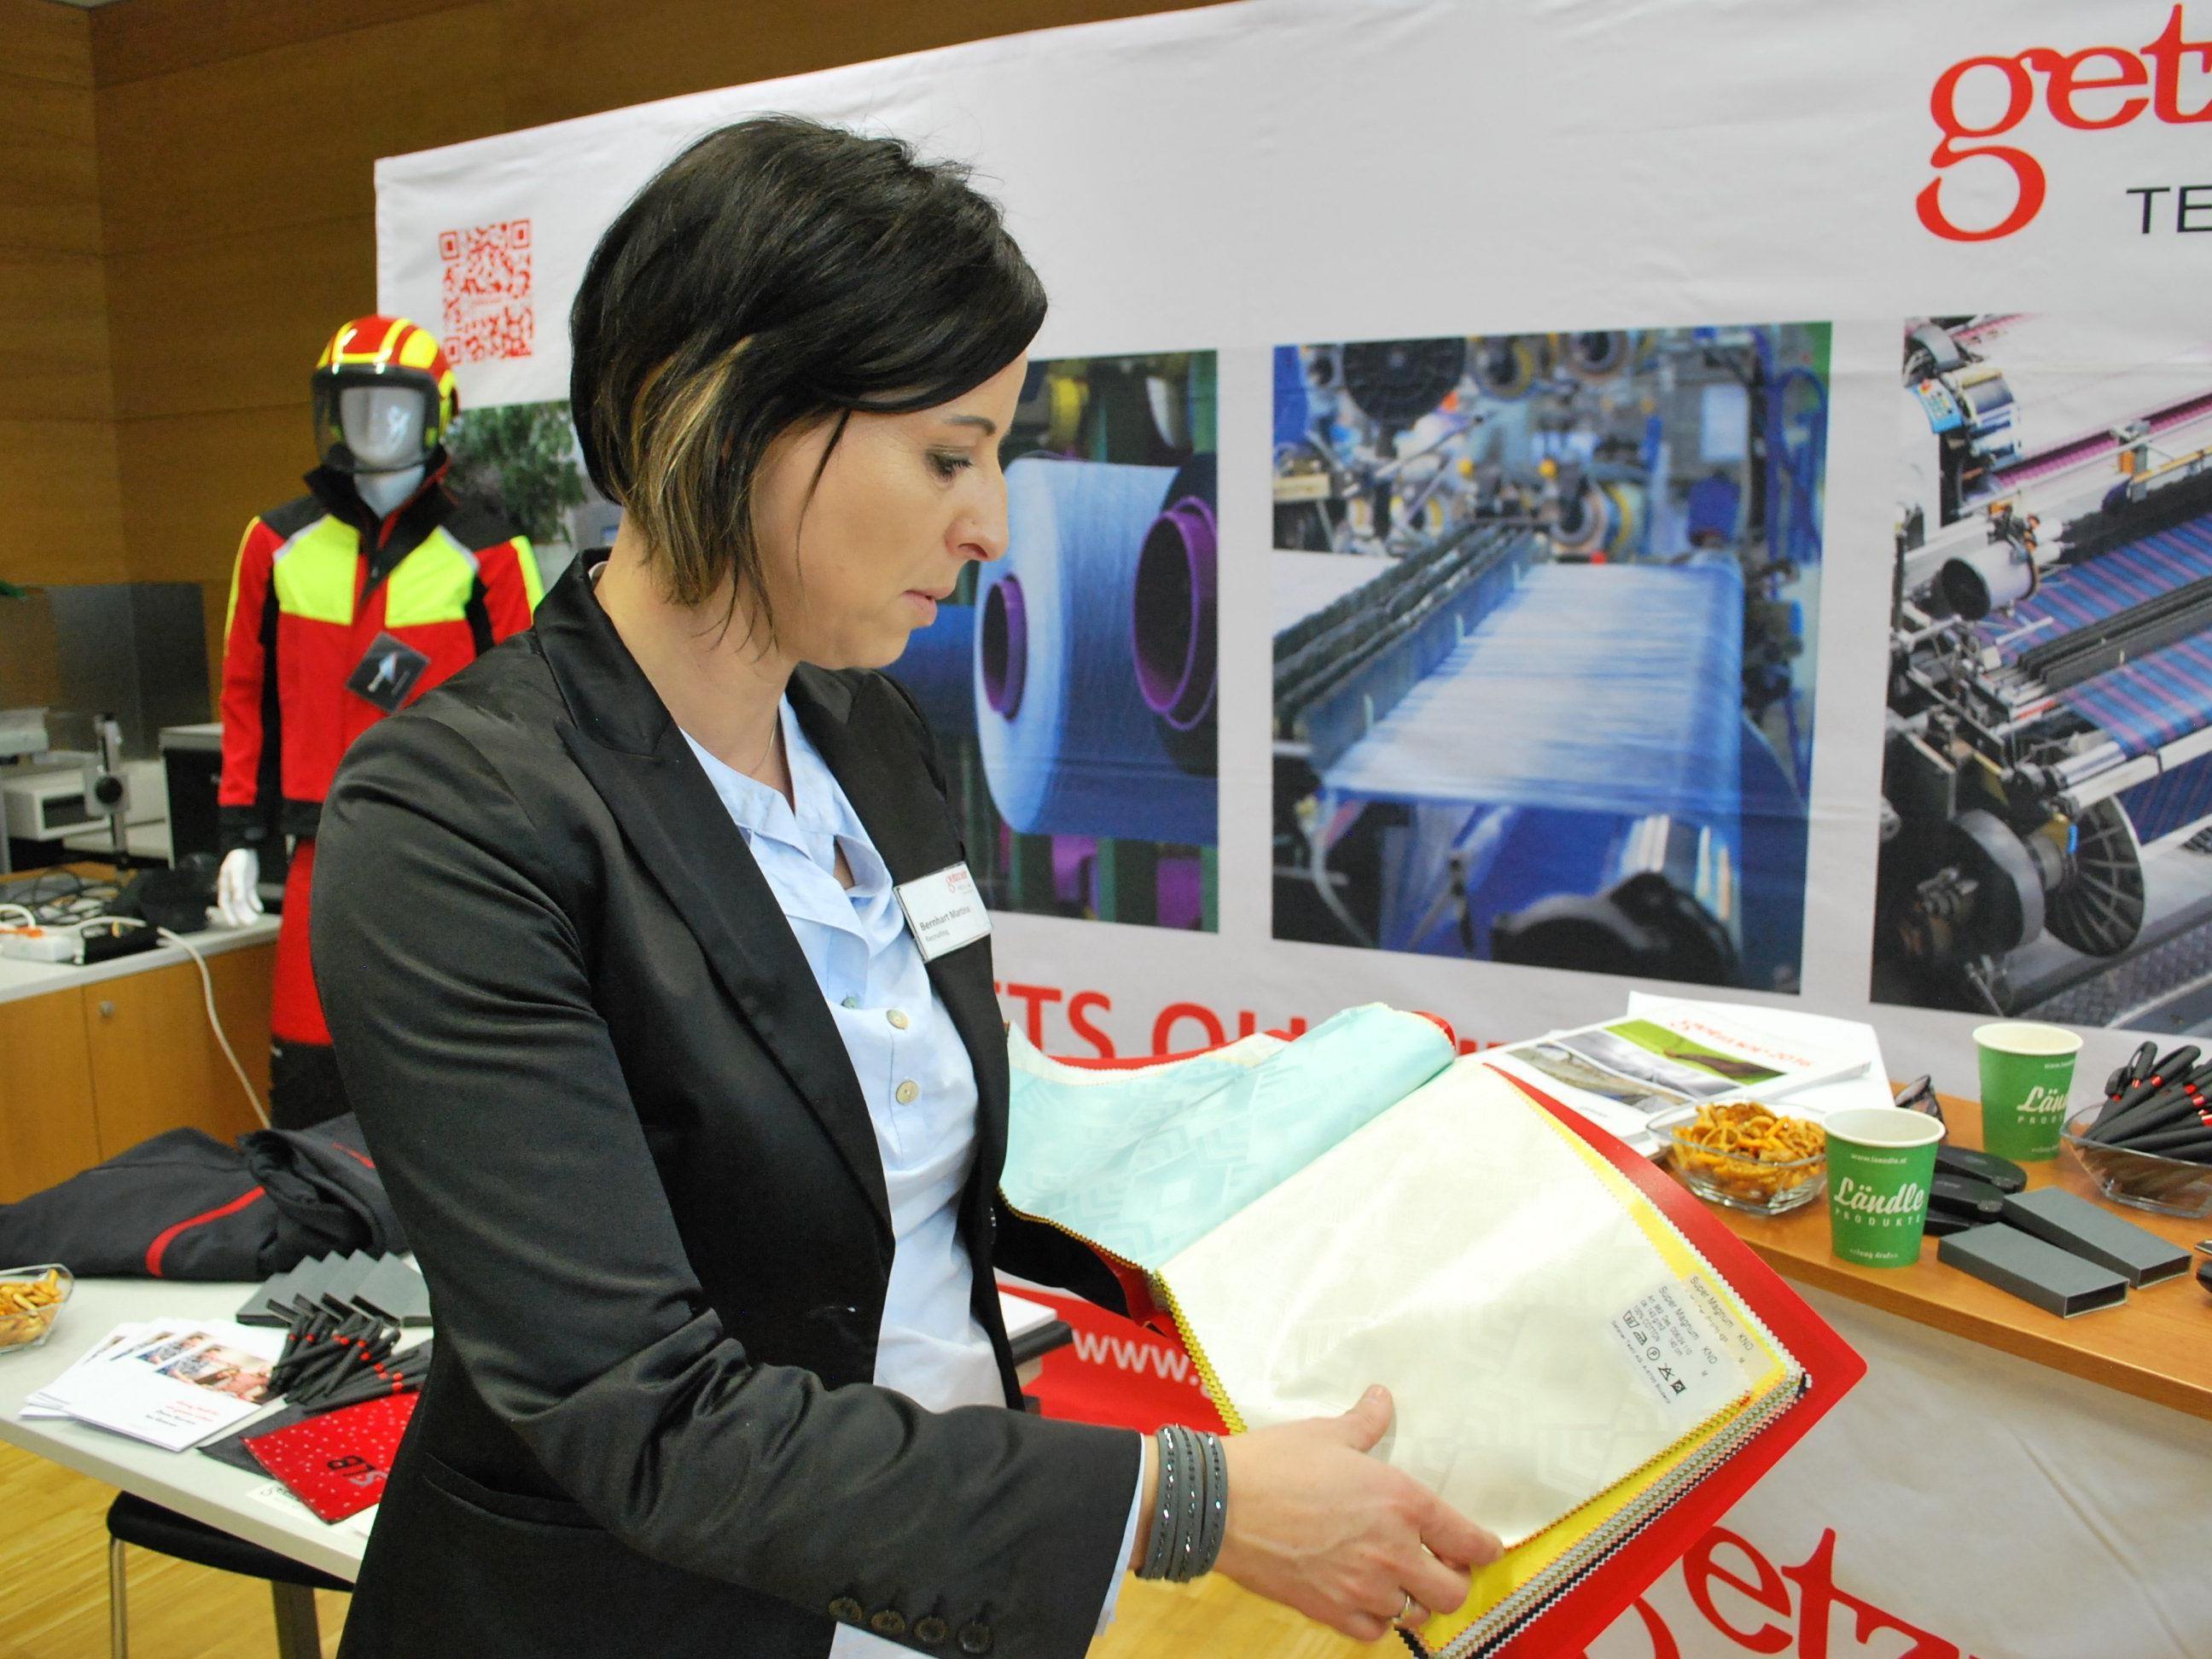 Martina Bernhart, Recruting Getzner Textil AG, zeigt Damast made in Bludenz.